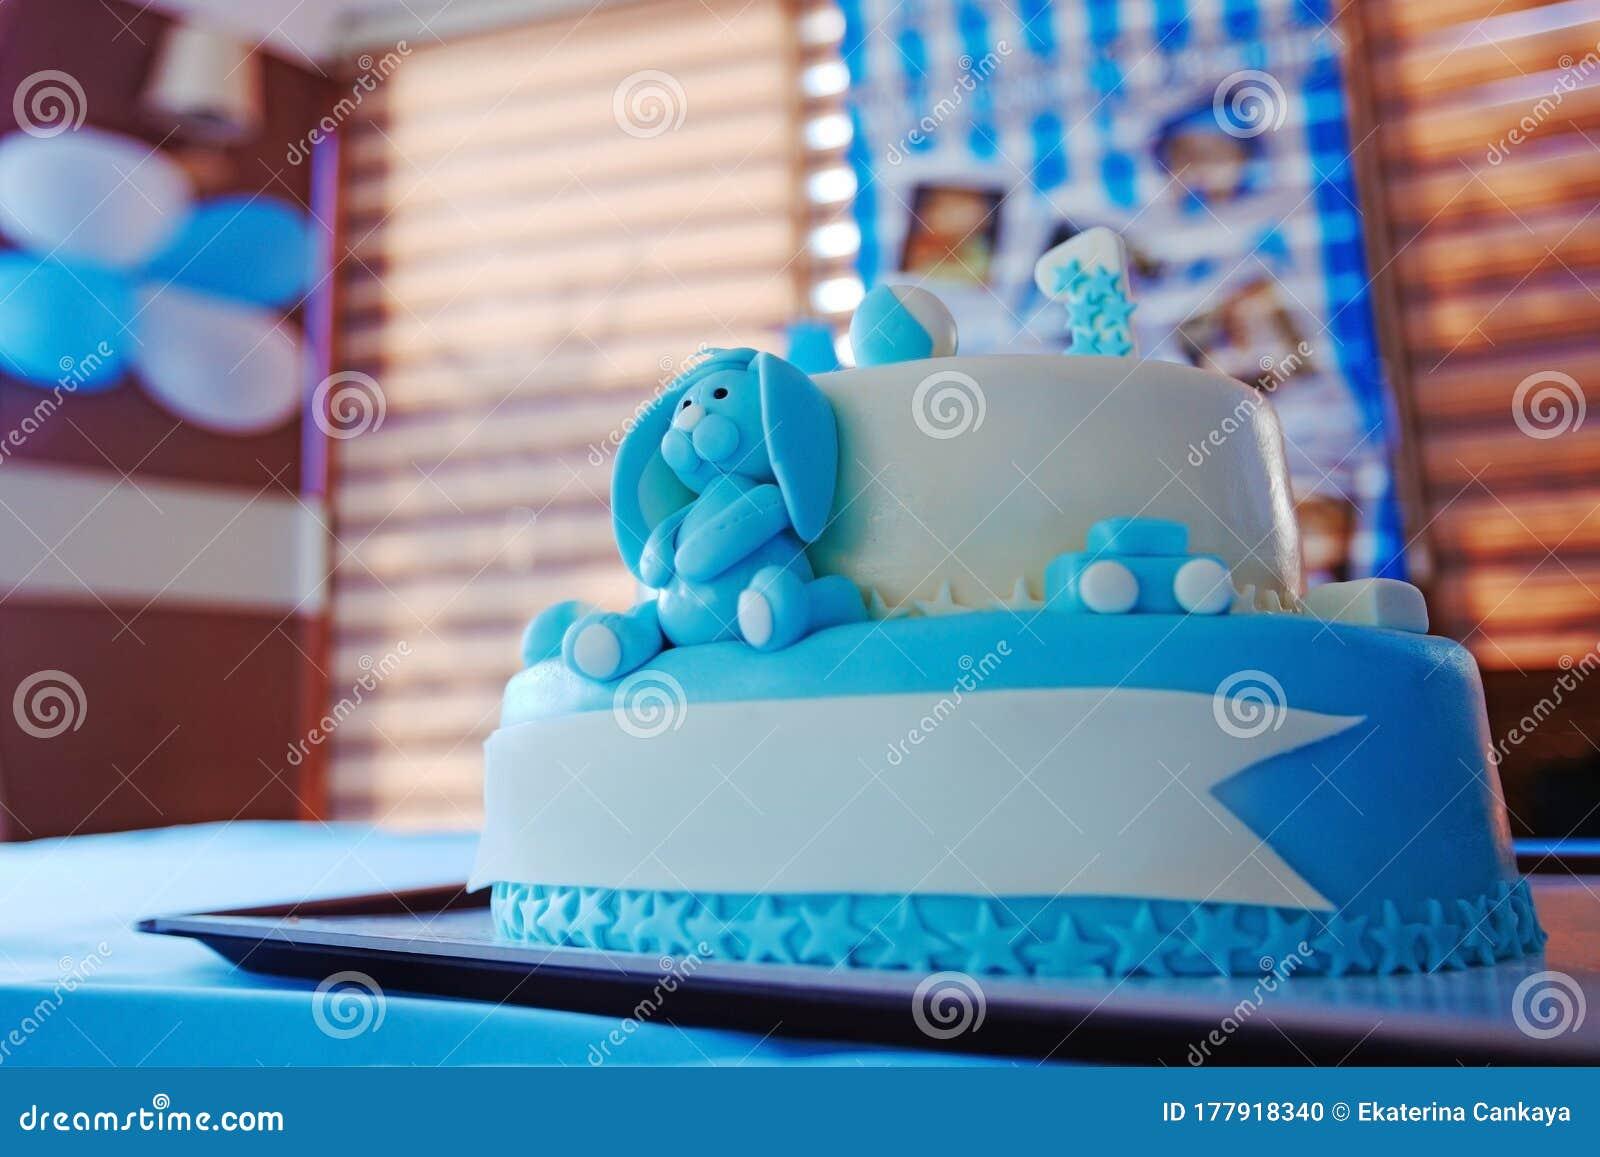 Birthday Cake For 1 Year Old Boy Stock Photo Image Of Celebration Candy 177918340